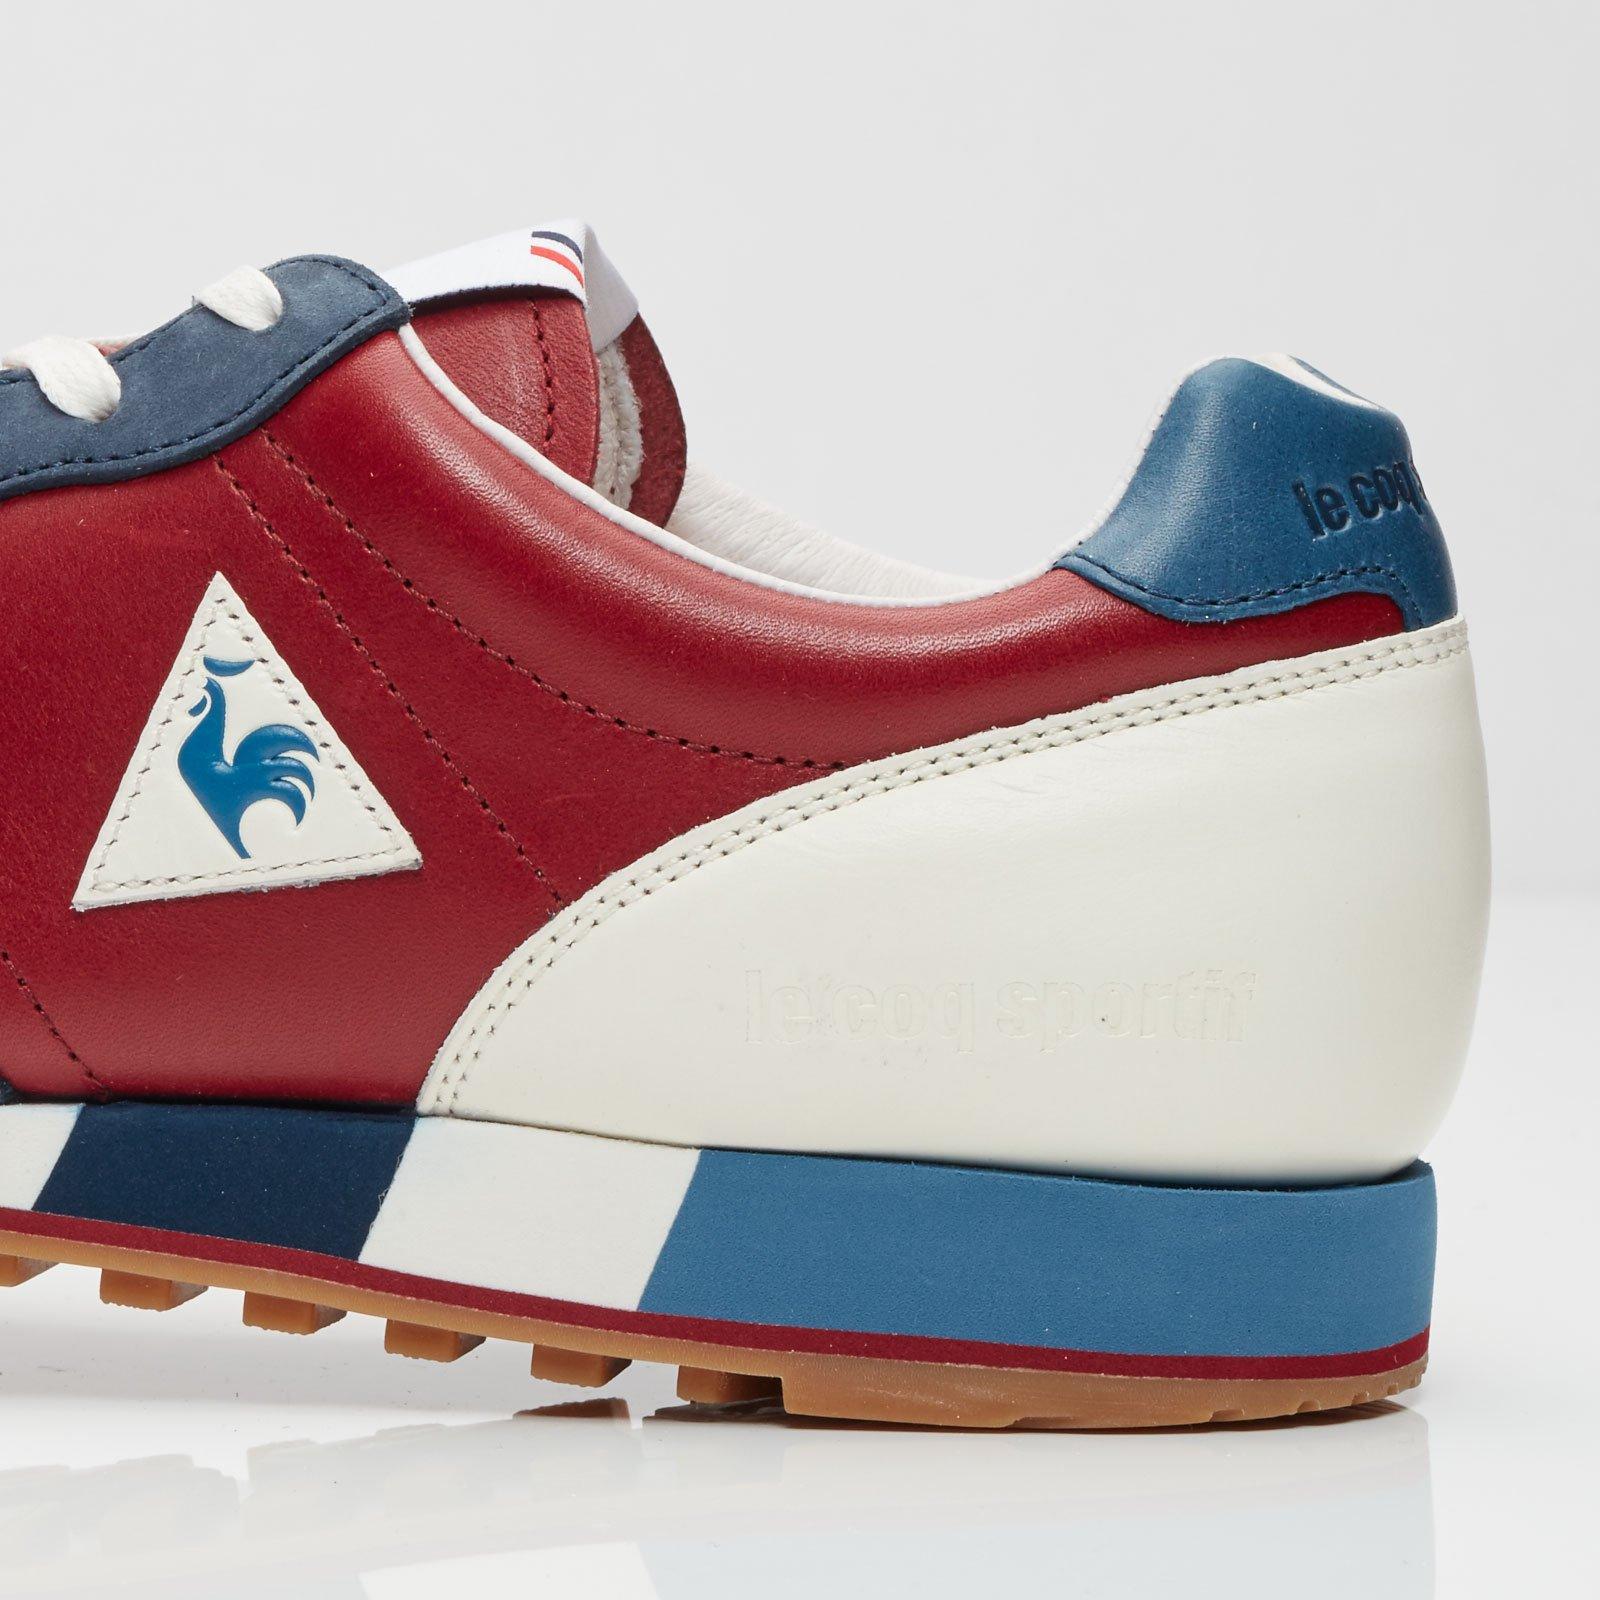 le coq sportif OMEGA - Trainers - dress blue 4yATFVjUak